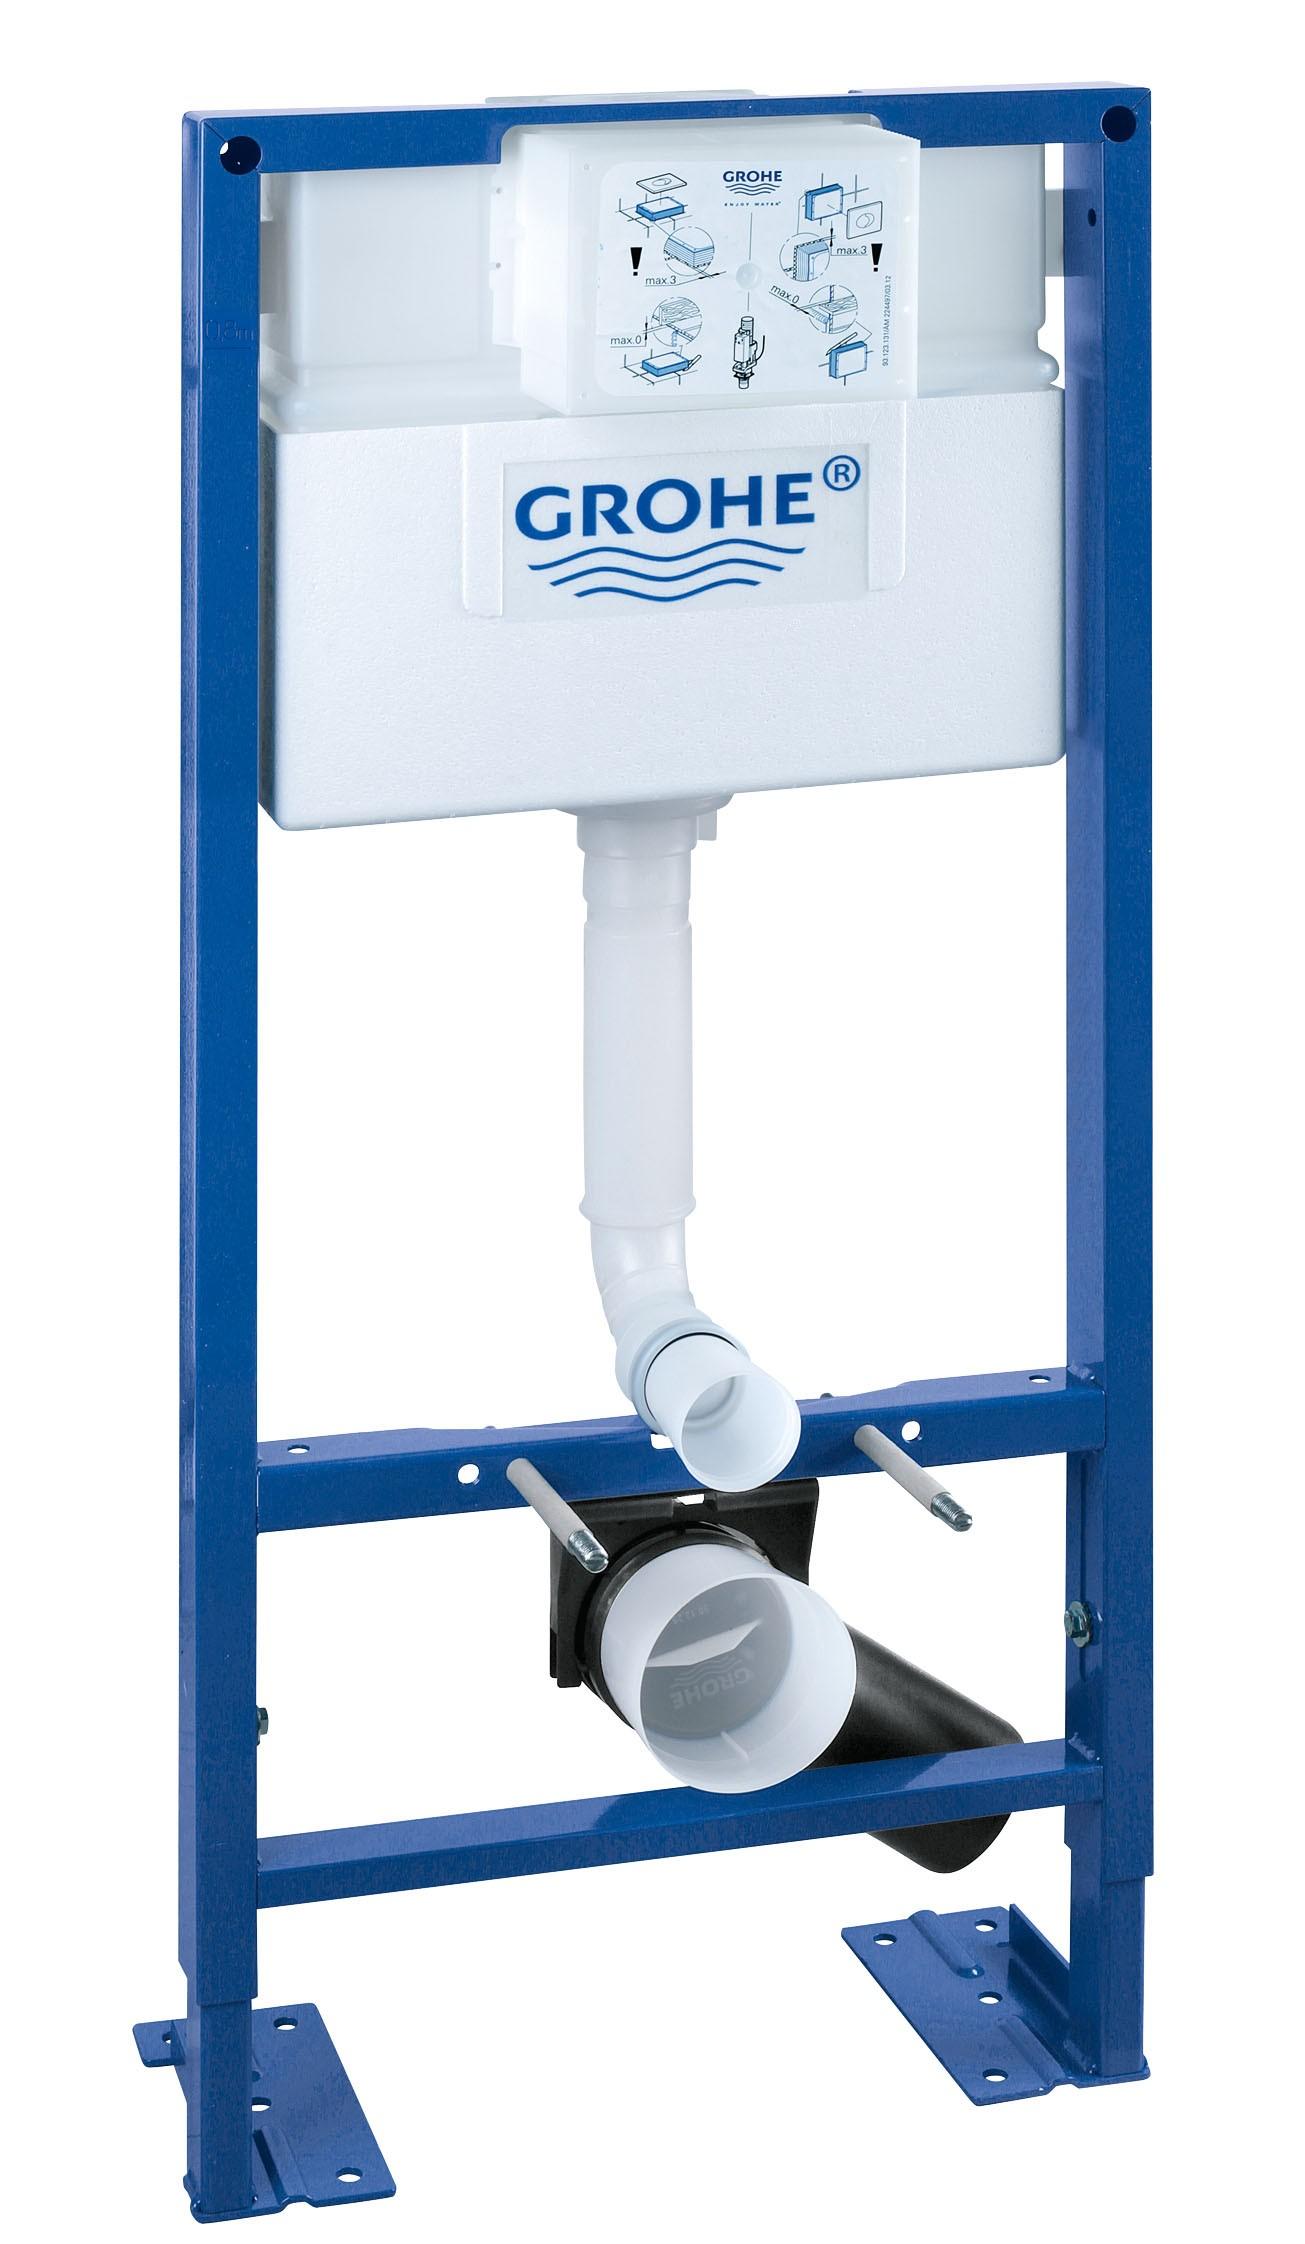 ������� ����������� ��� ������� Grohe 38586001 Rapid SL (1 �) (38586001)